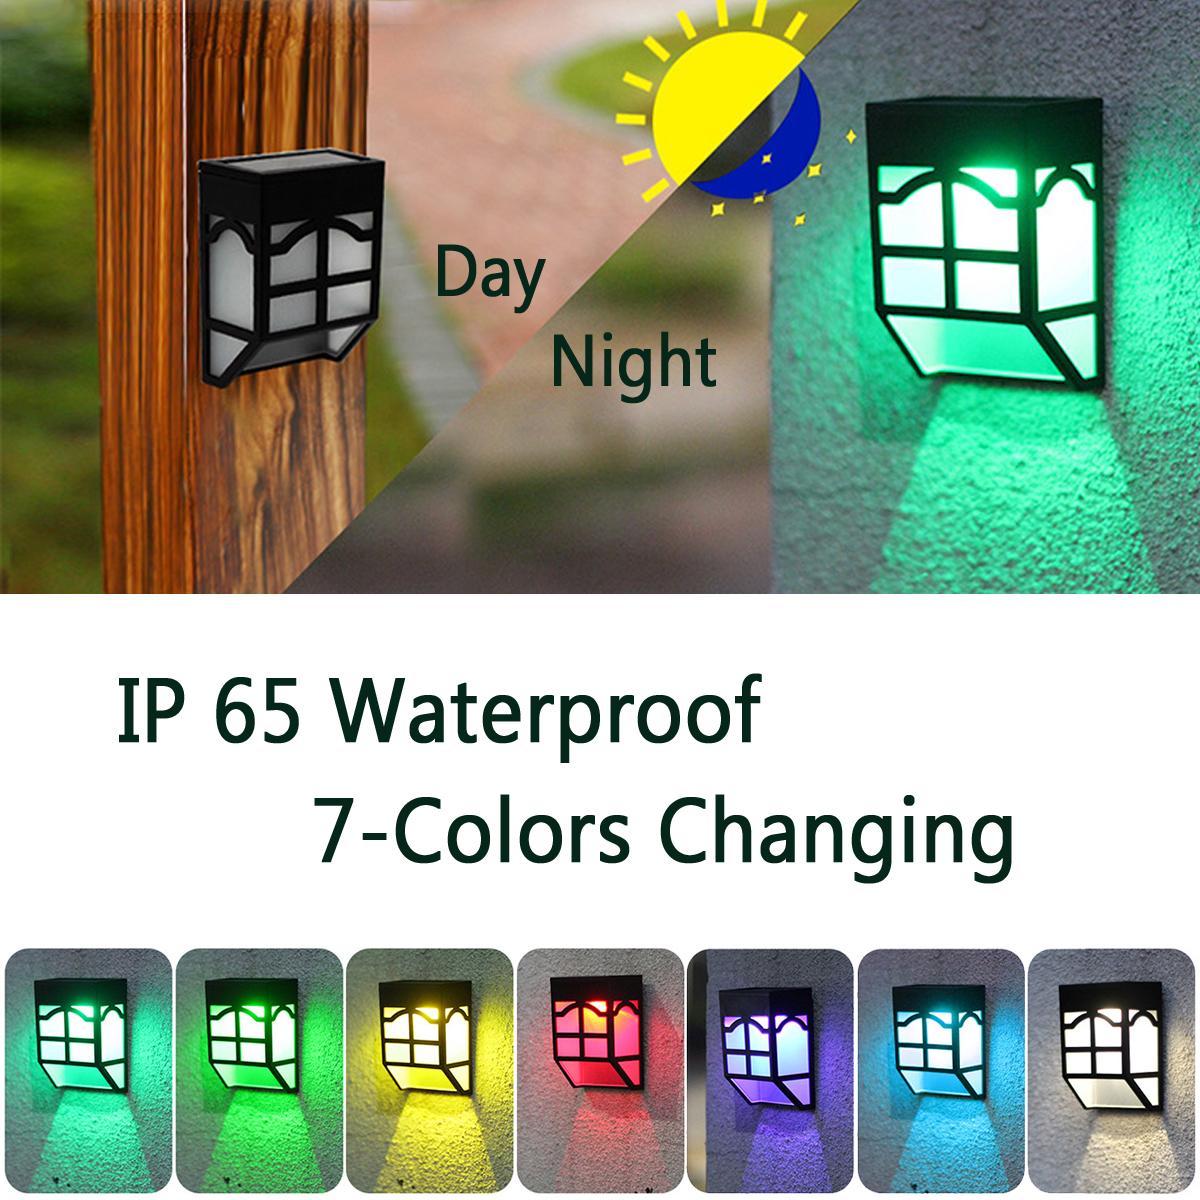 НаоткрытомвоздухеСолнечнаяСадСвет LED Путь стены Пейзаж Mount Light Забор Фонарь Street Лампа - фото 1